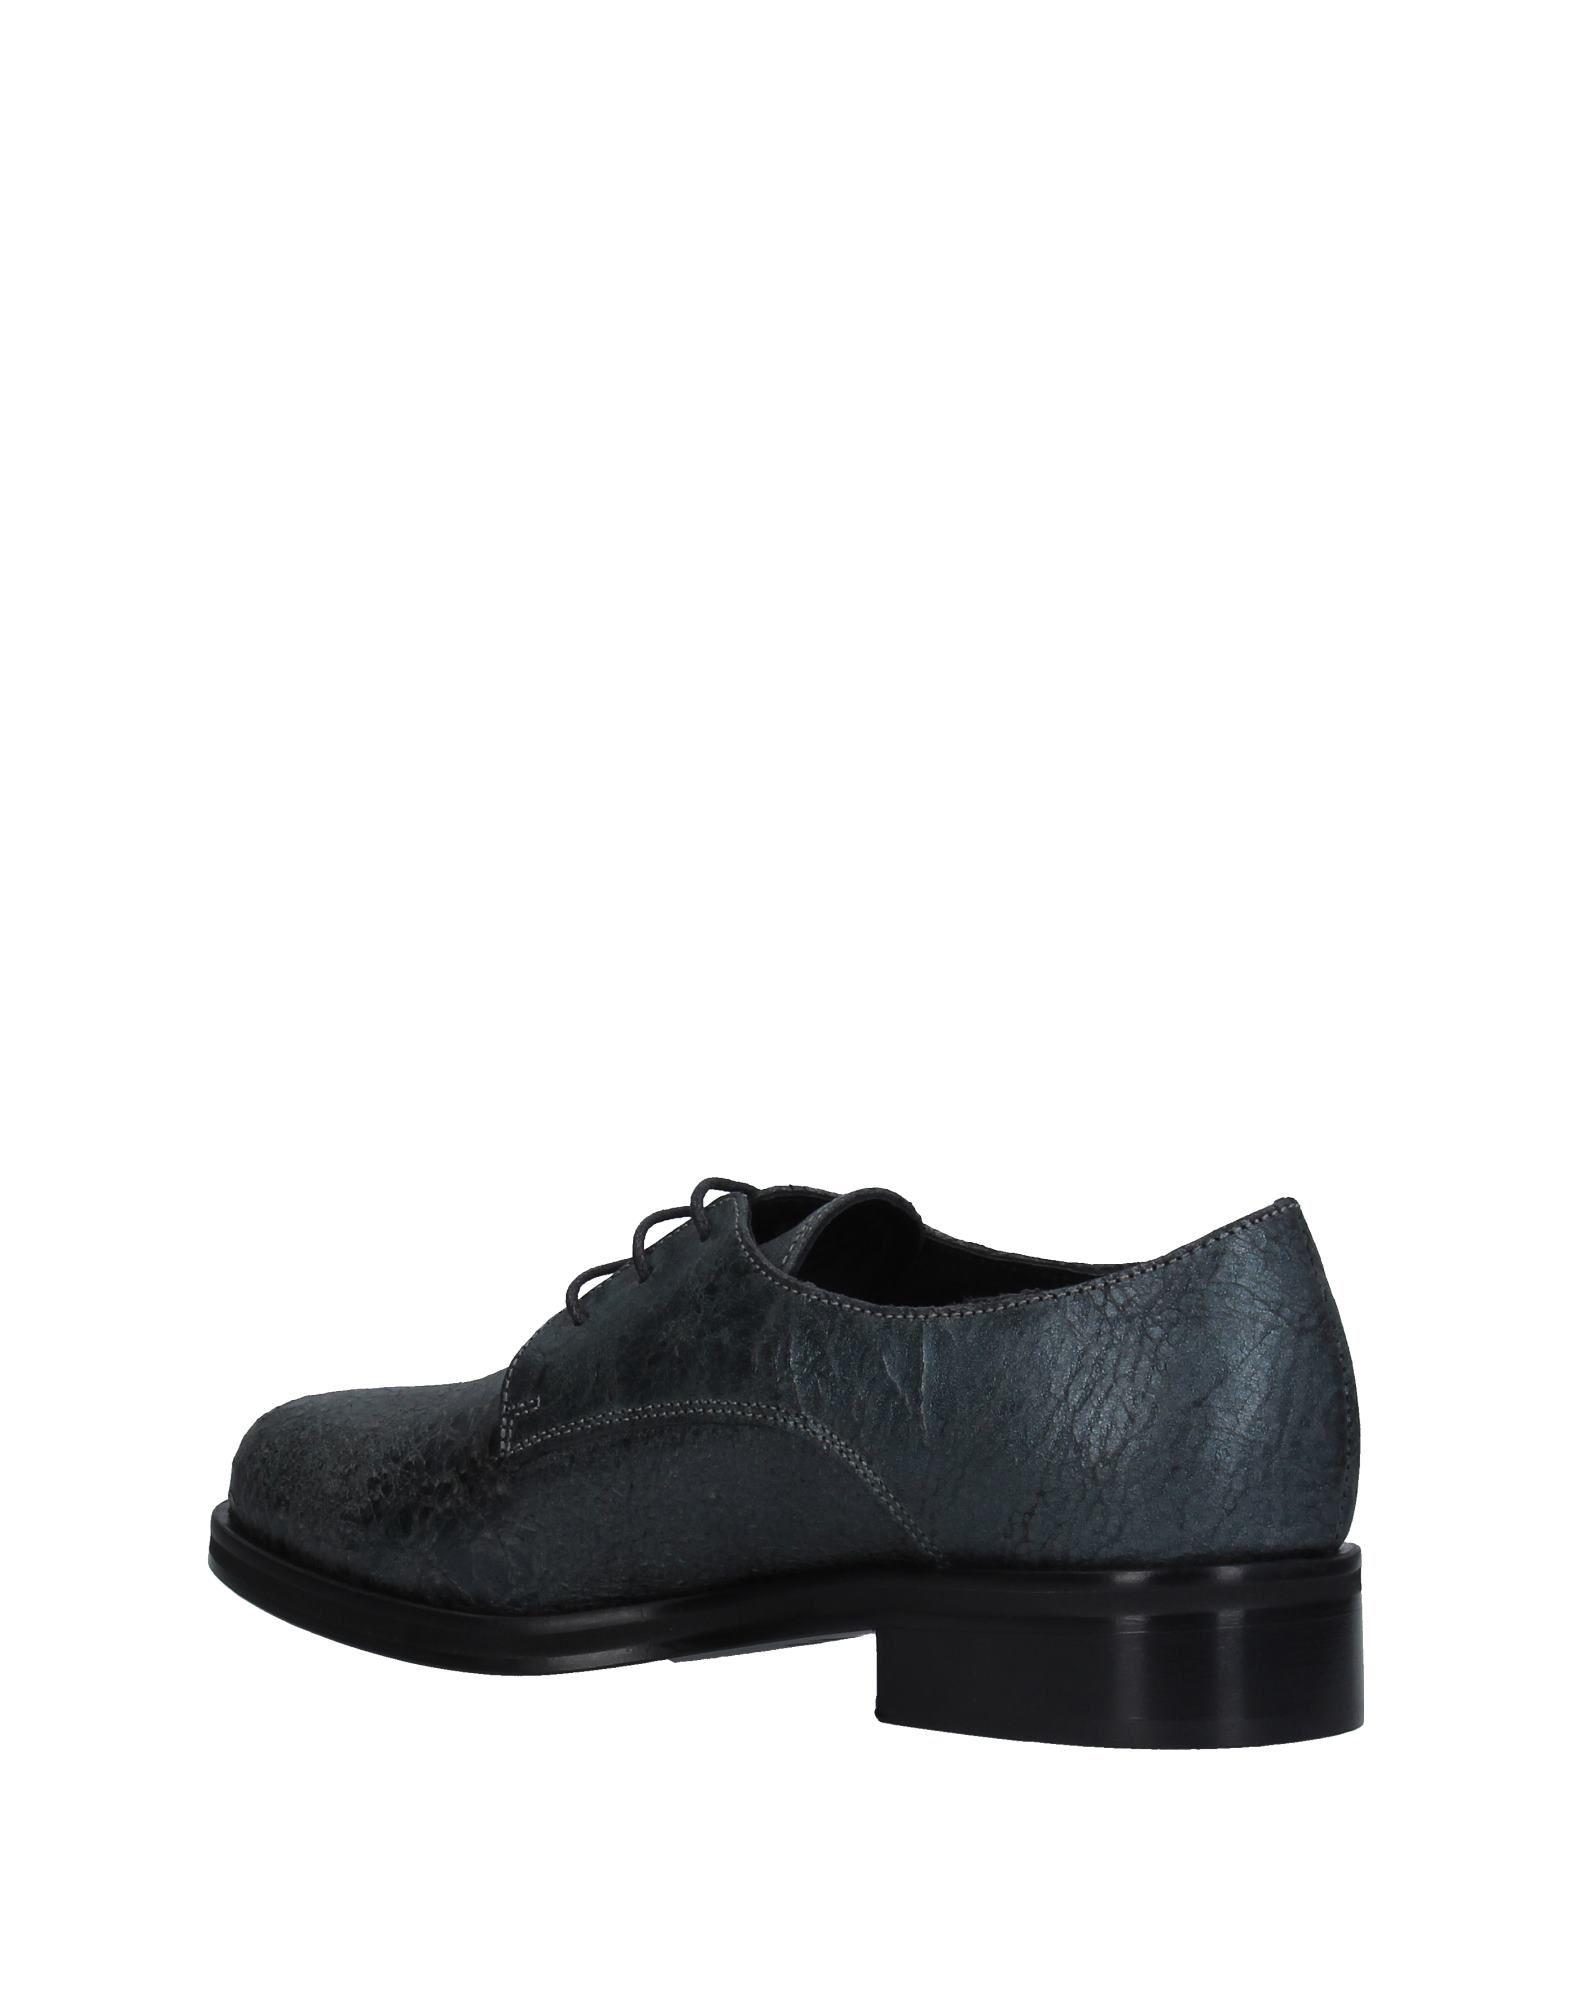 Chaussures À Lacets Giancarlo Paoli Femme - Chaussures À Lacets Giancarlo Paoli sur